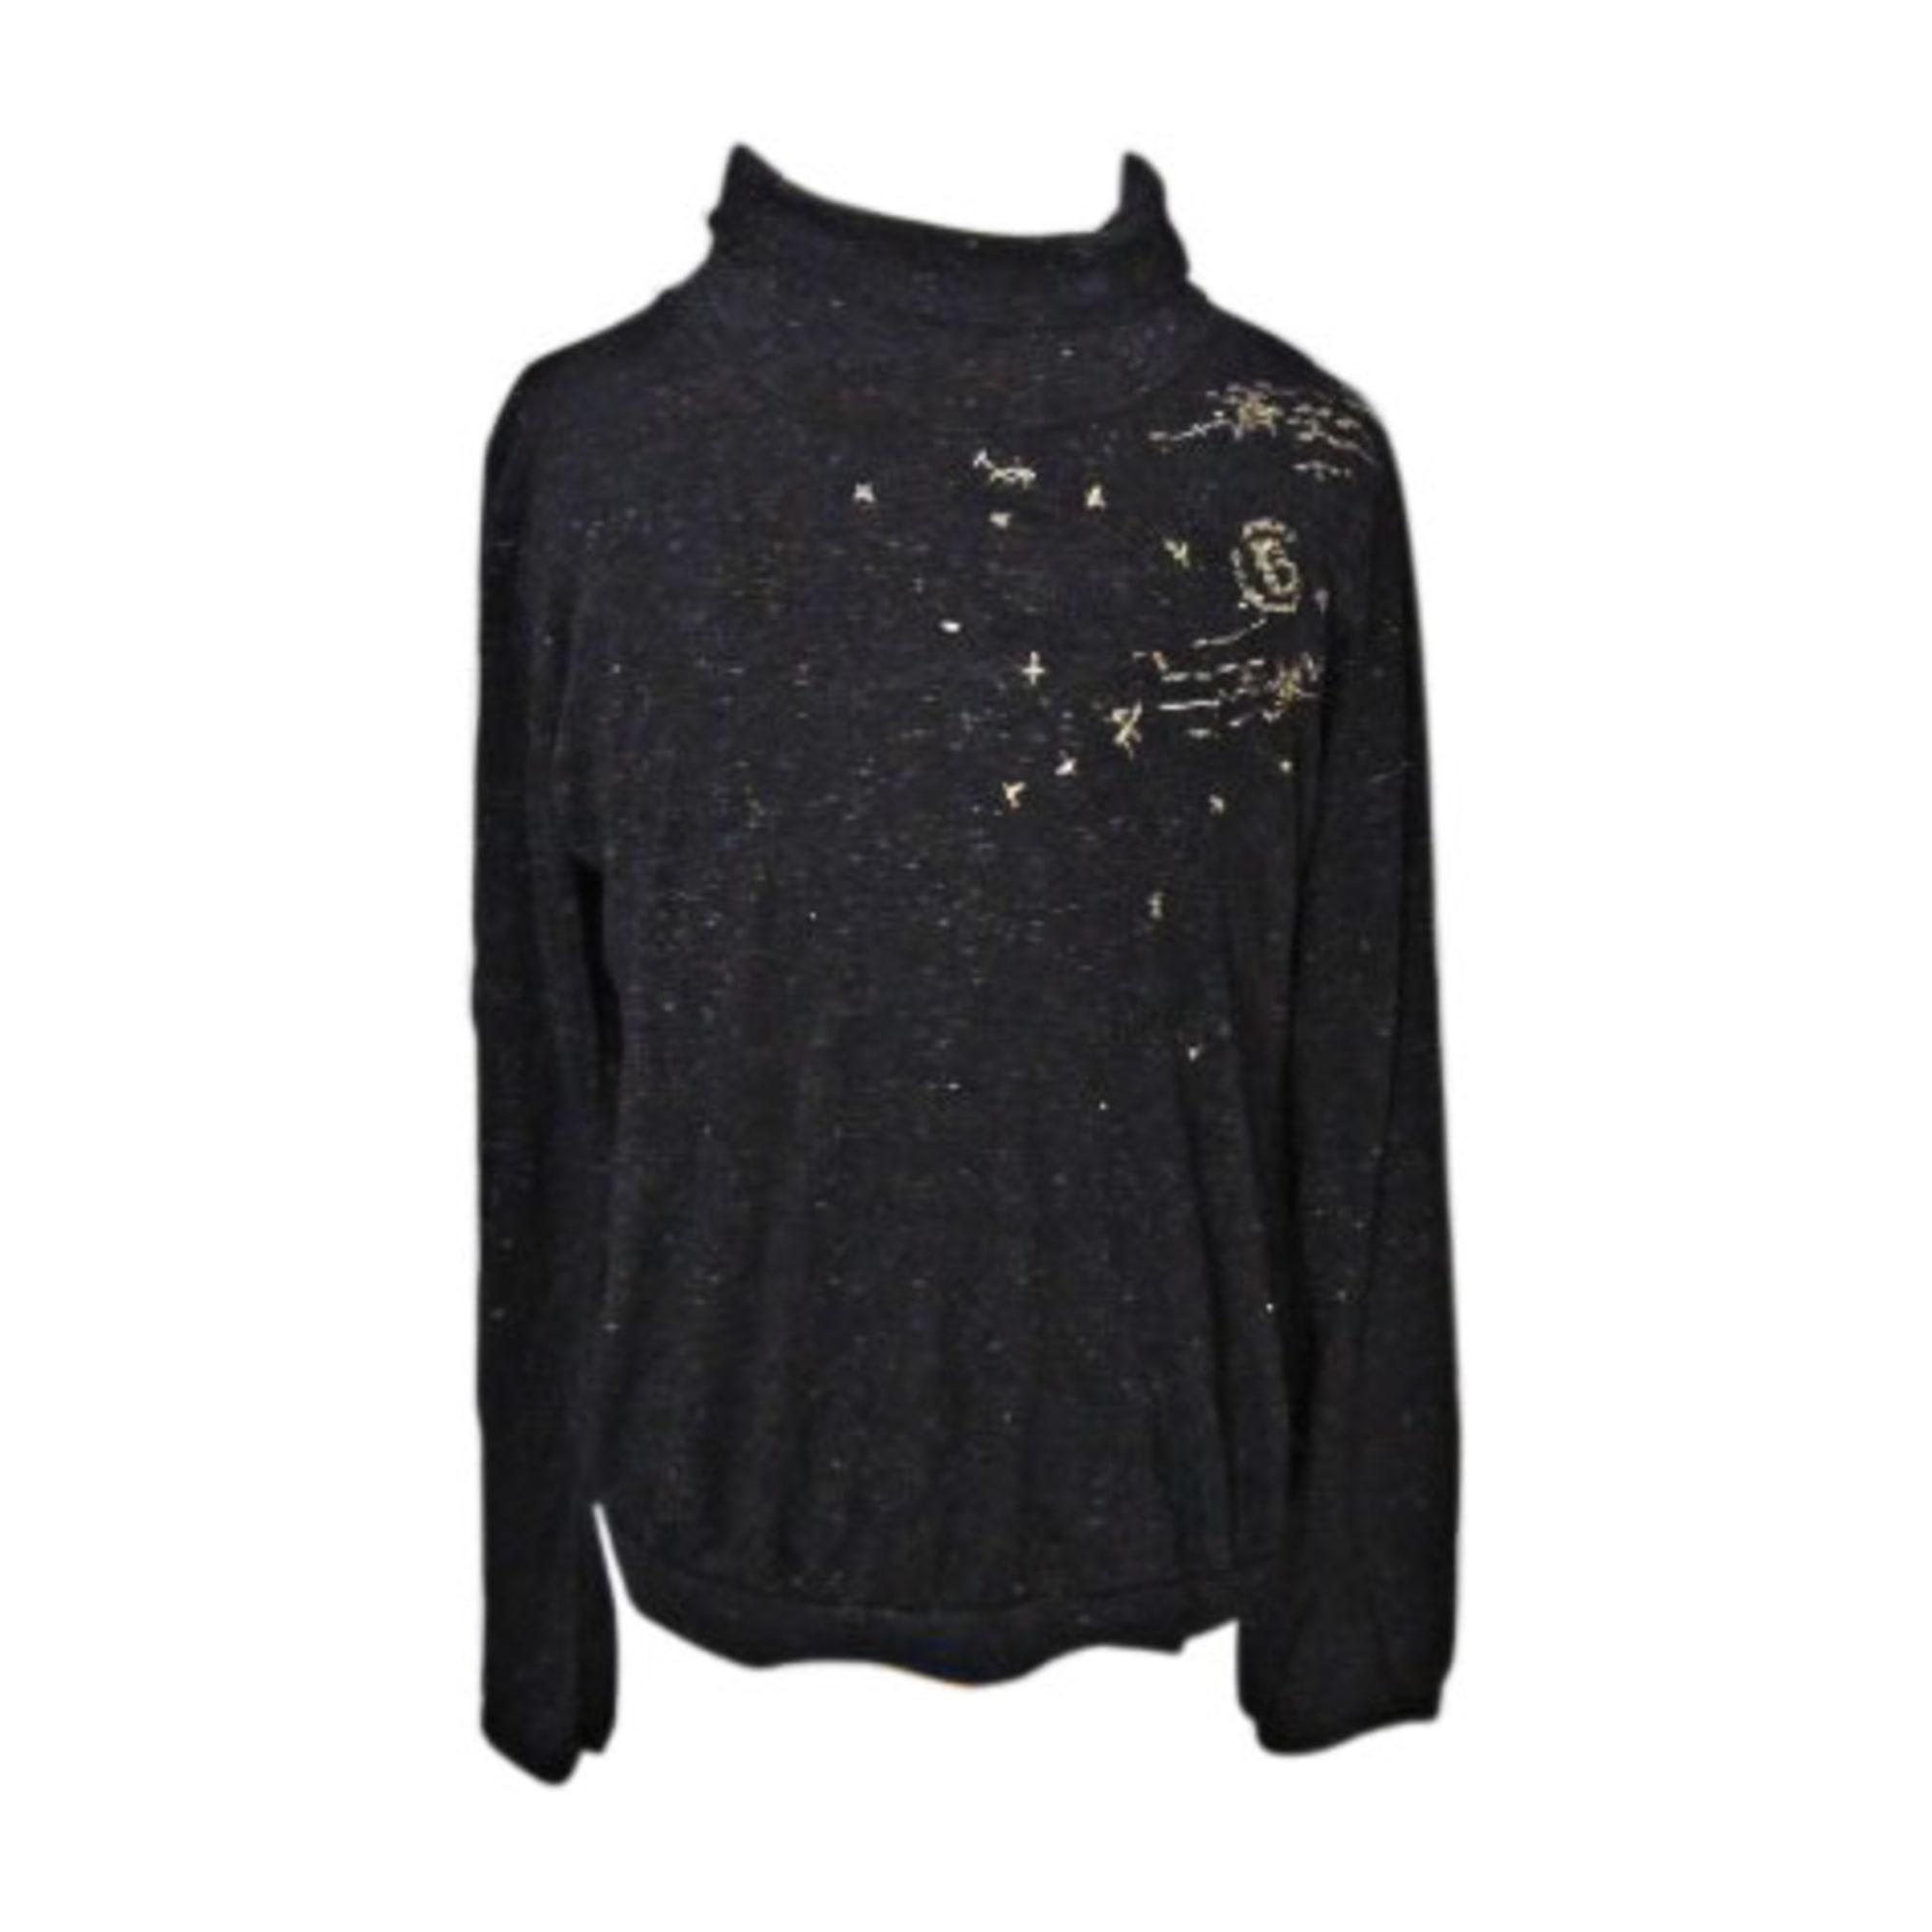 Top, Tee-shirt JEAN BOURGET Noir